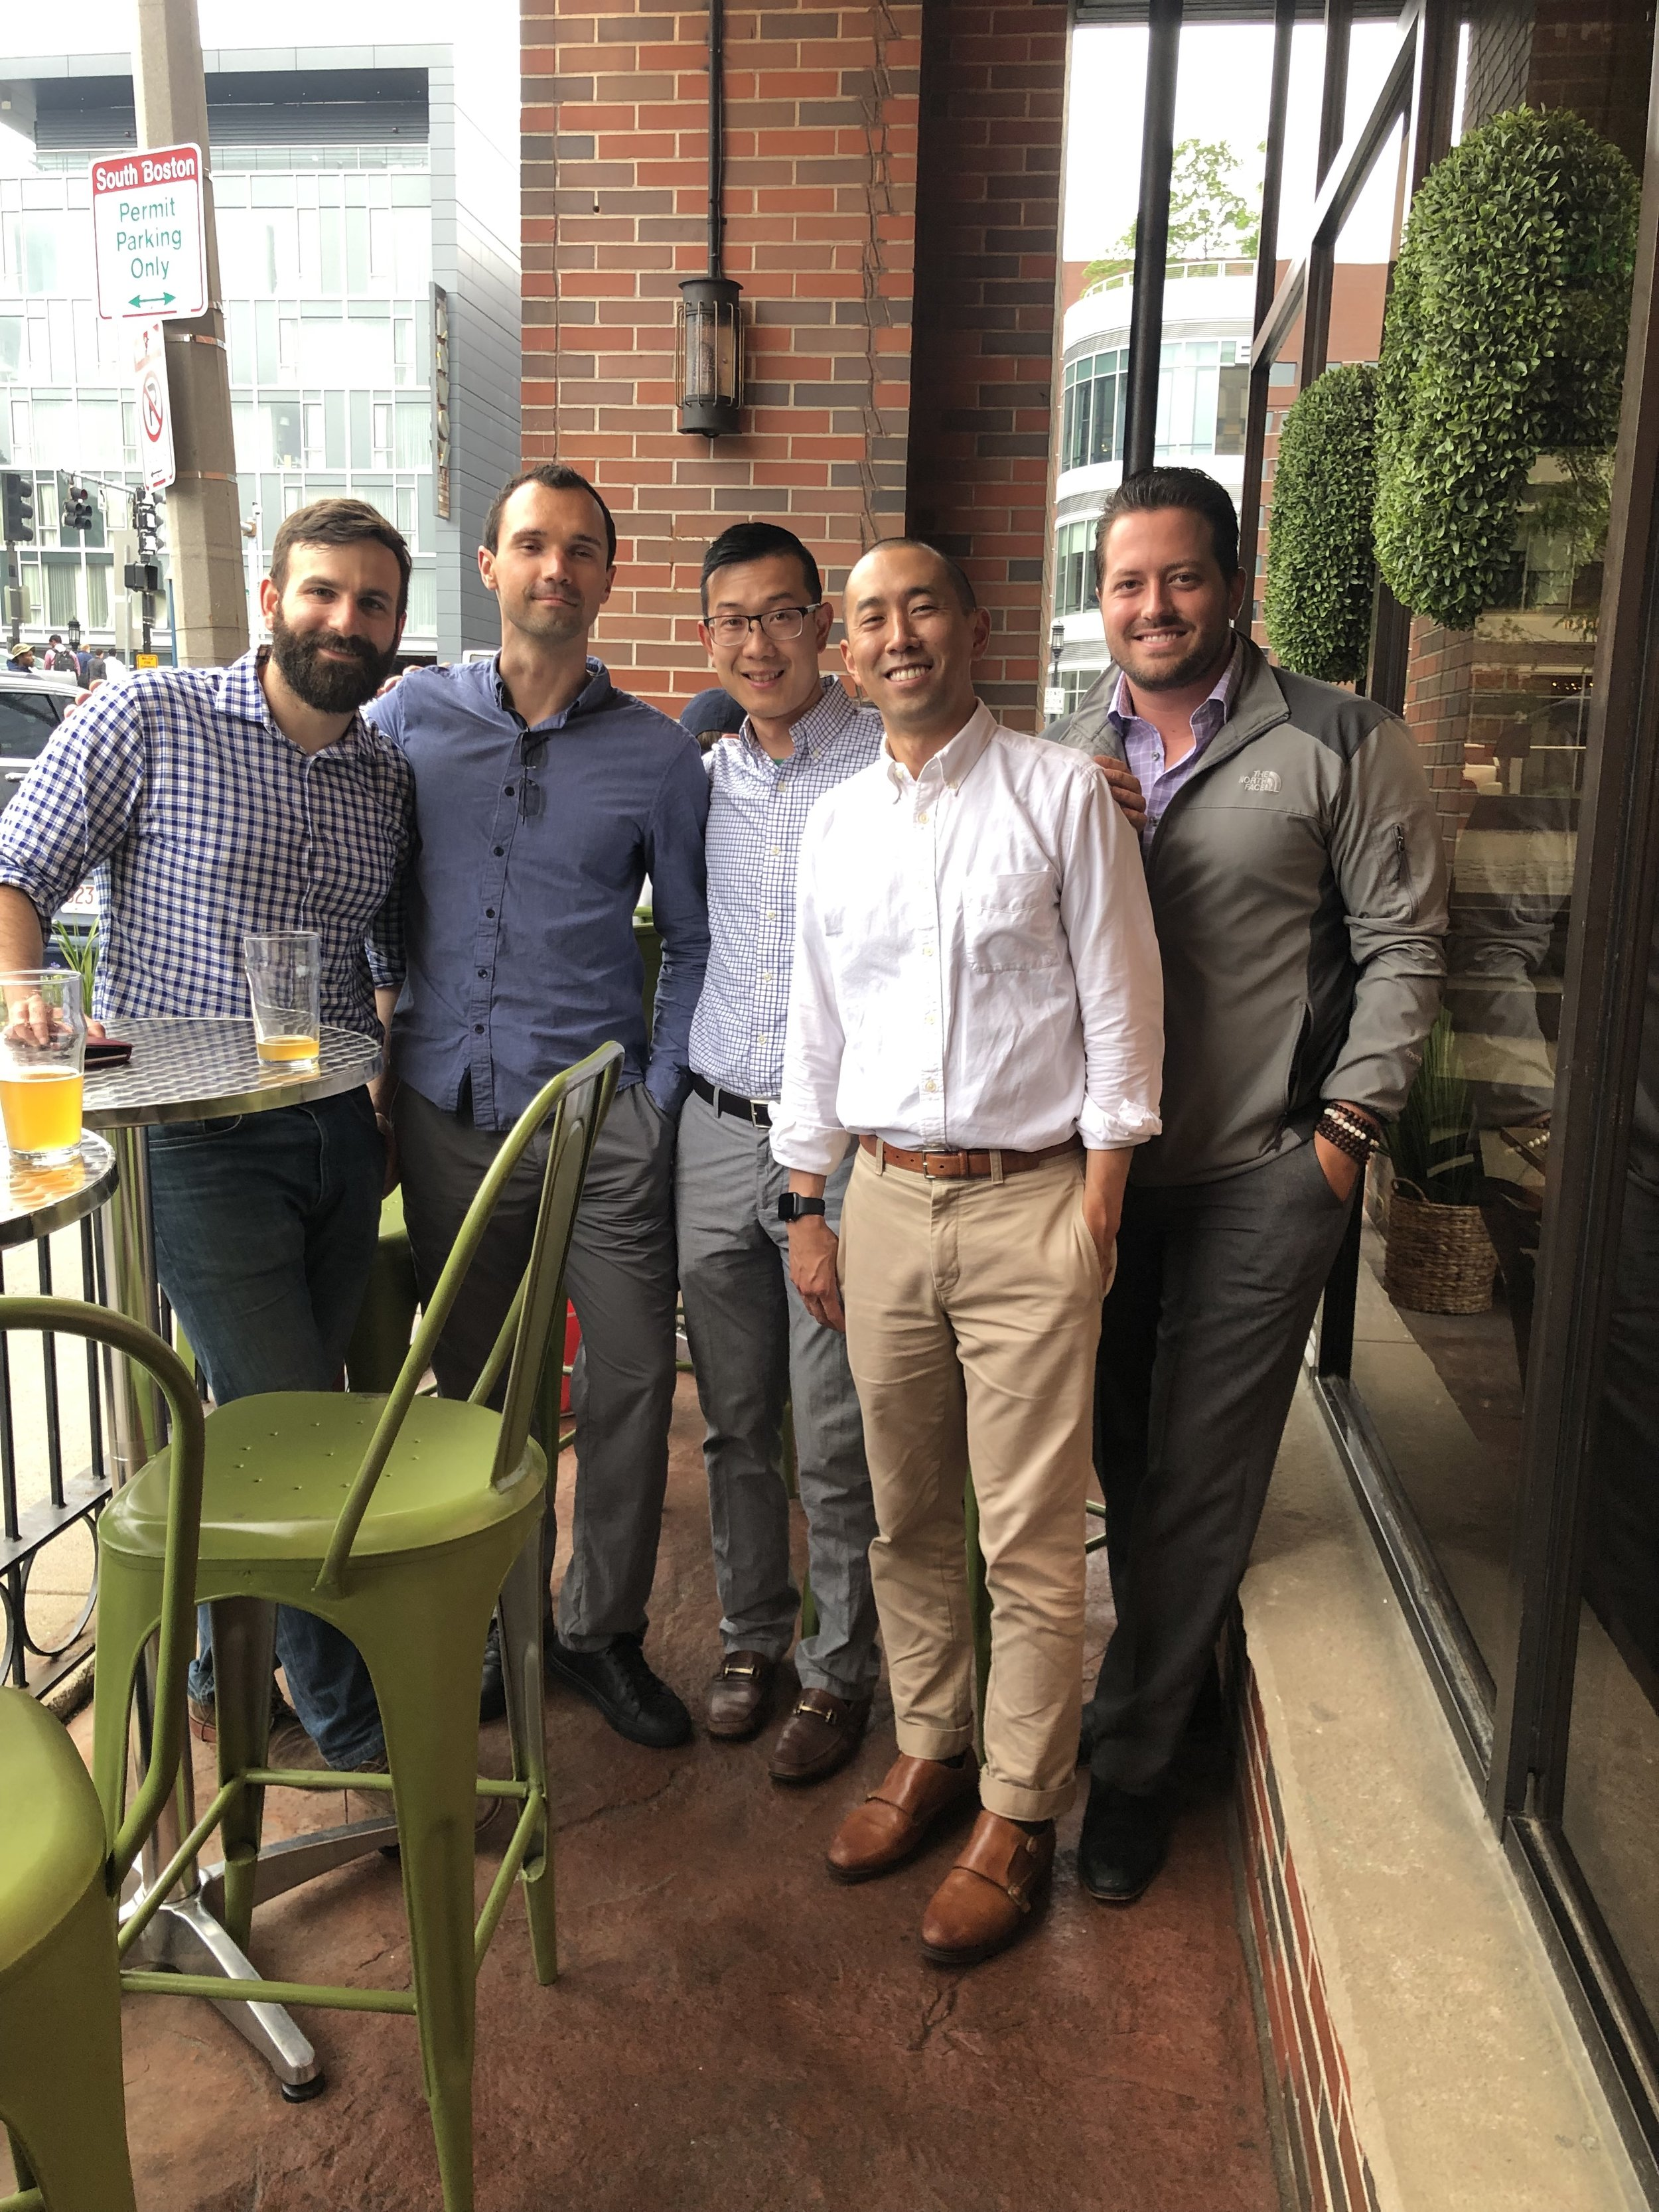 Robert Cakounes, Kirill Sinyavsky, Stan Liu, Scott Kobayashi, and Eric Nelsen